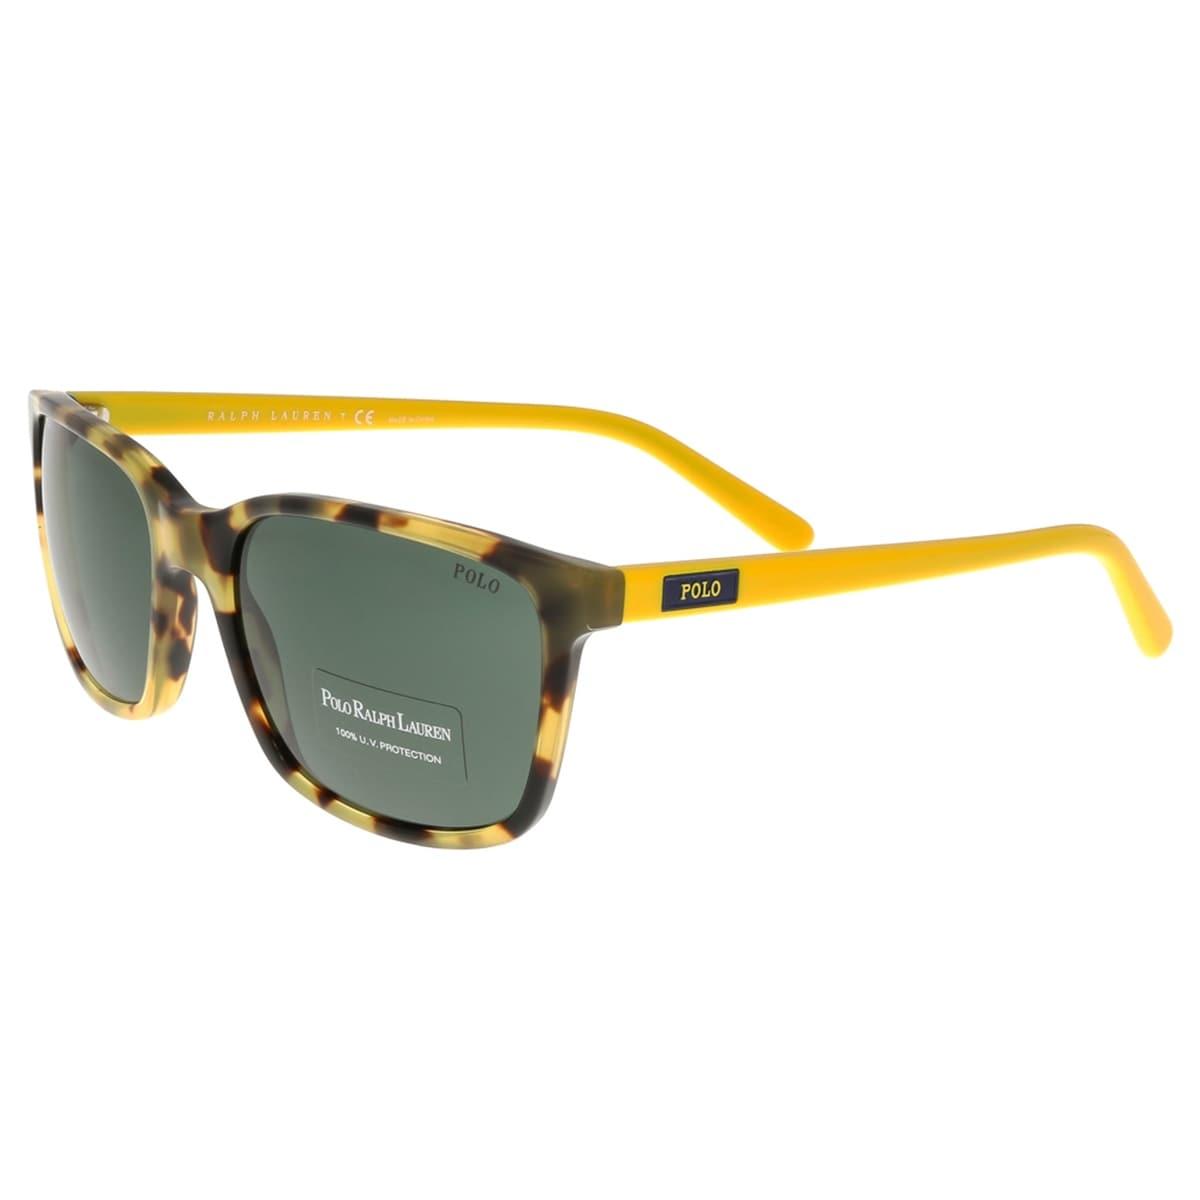 723d82f370ff Ralph Lauren Sunglasses | Shop our Best Clothing & Shoes Deals Online at  Overstock